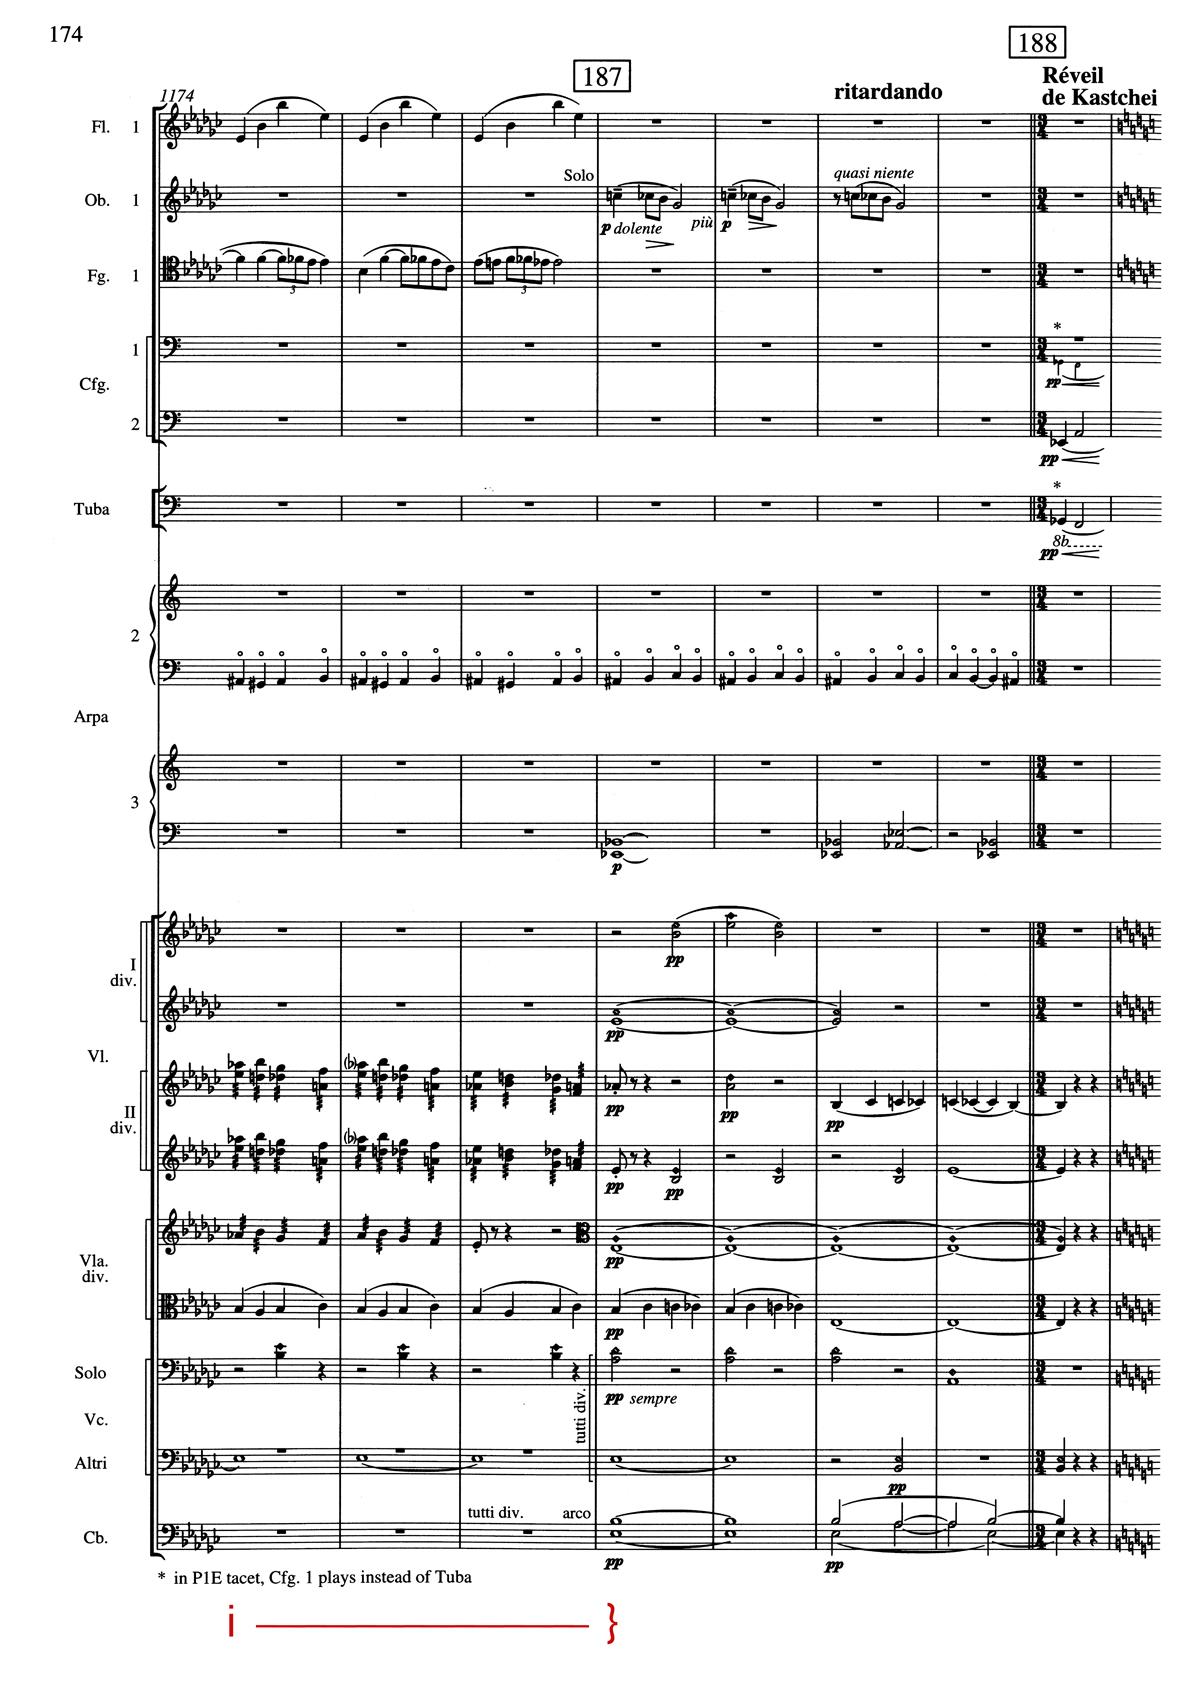 Stravinsky_Firebird_Theory_4.jpg